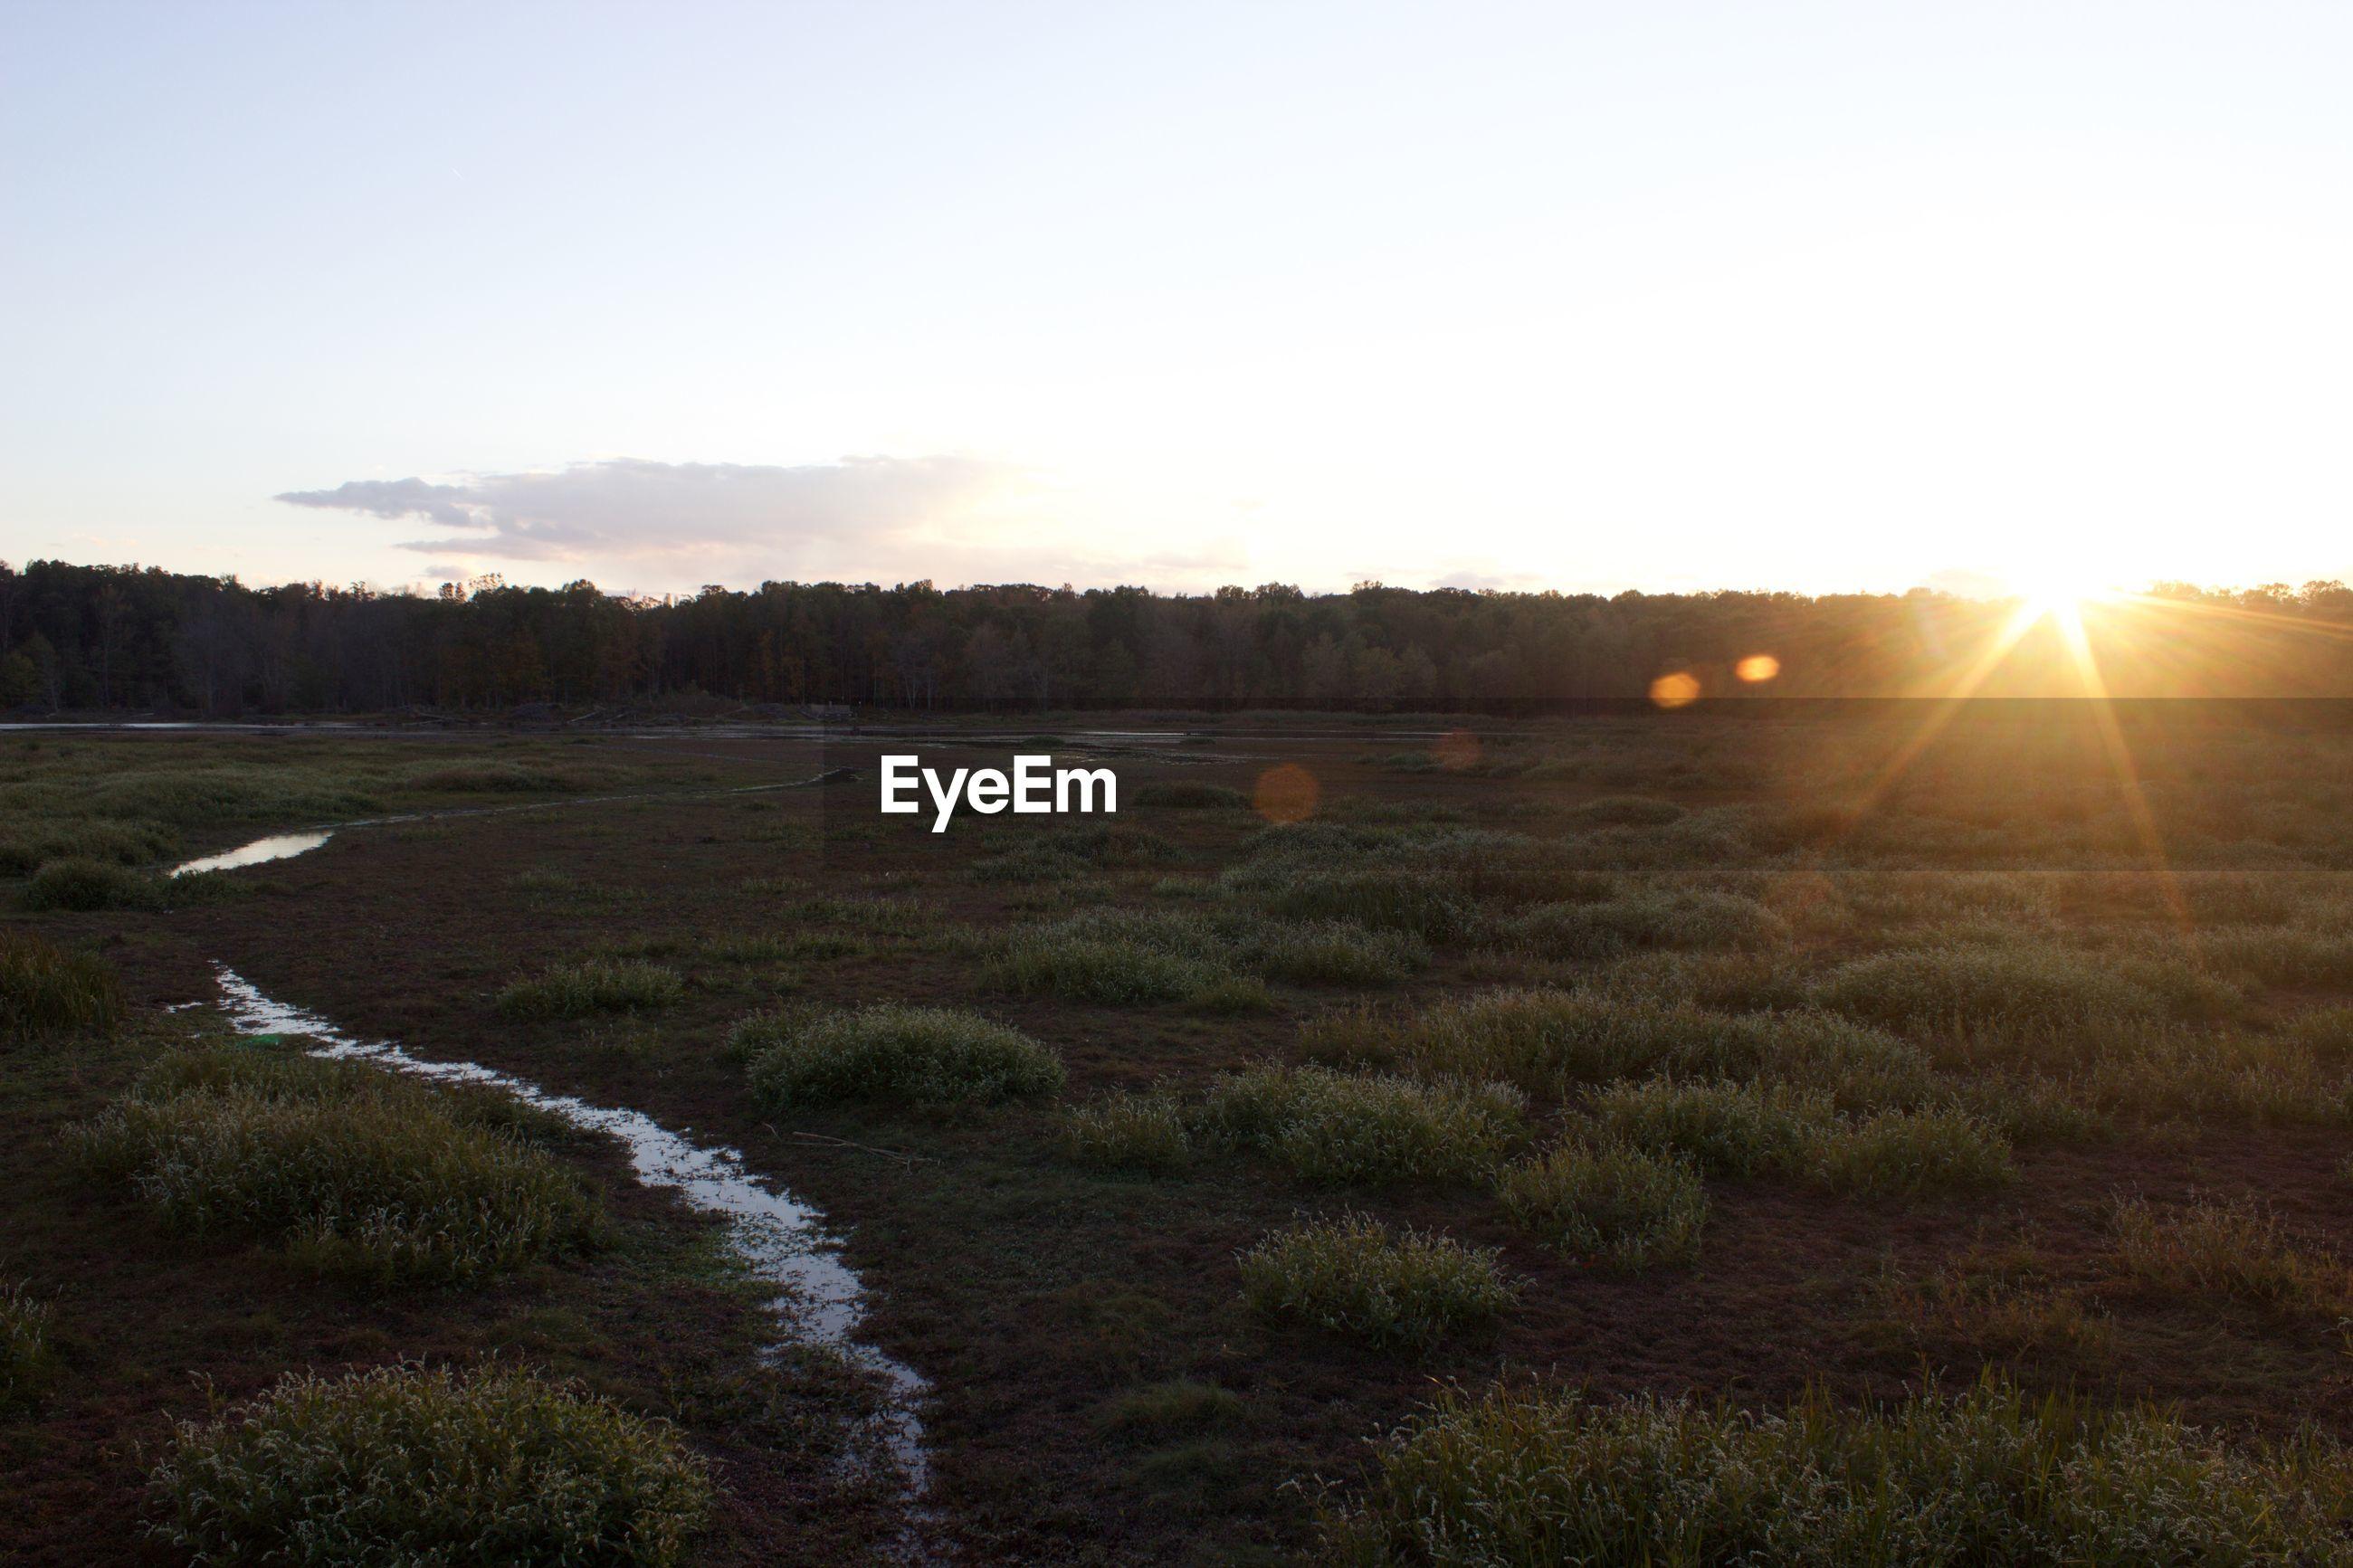 SUNSET OVER GRASSY FIELD